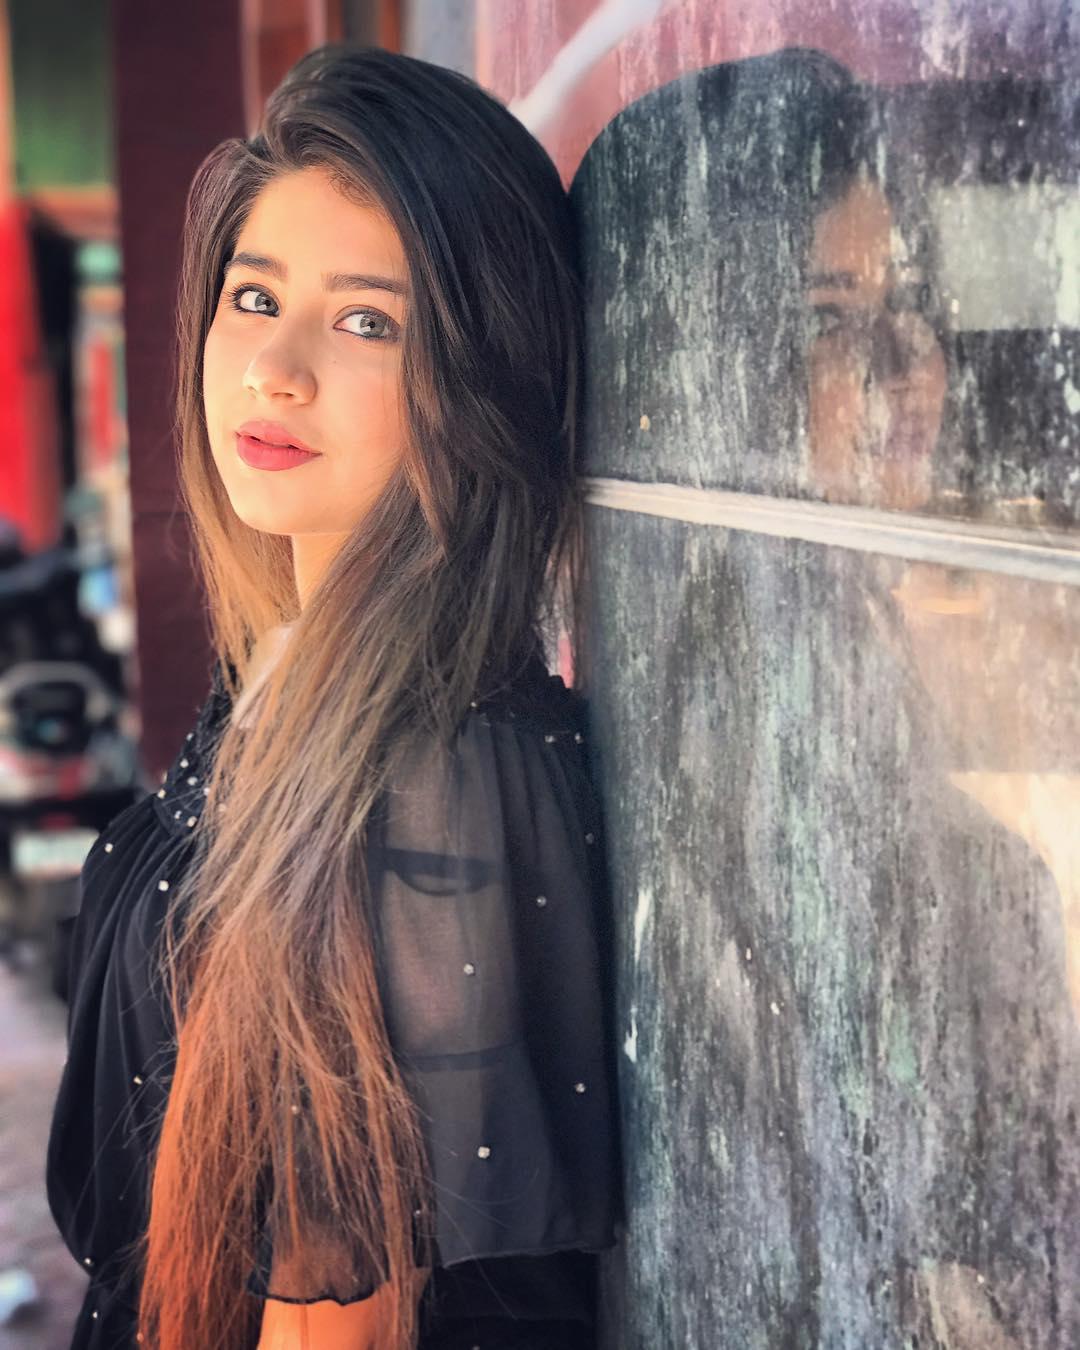 Aditi Bhatia Instagram username